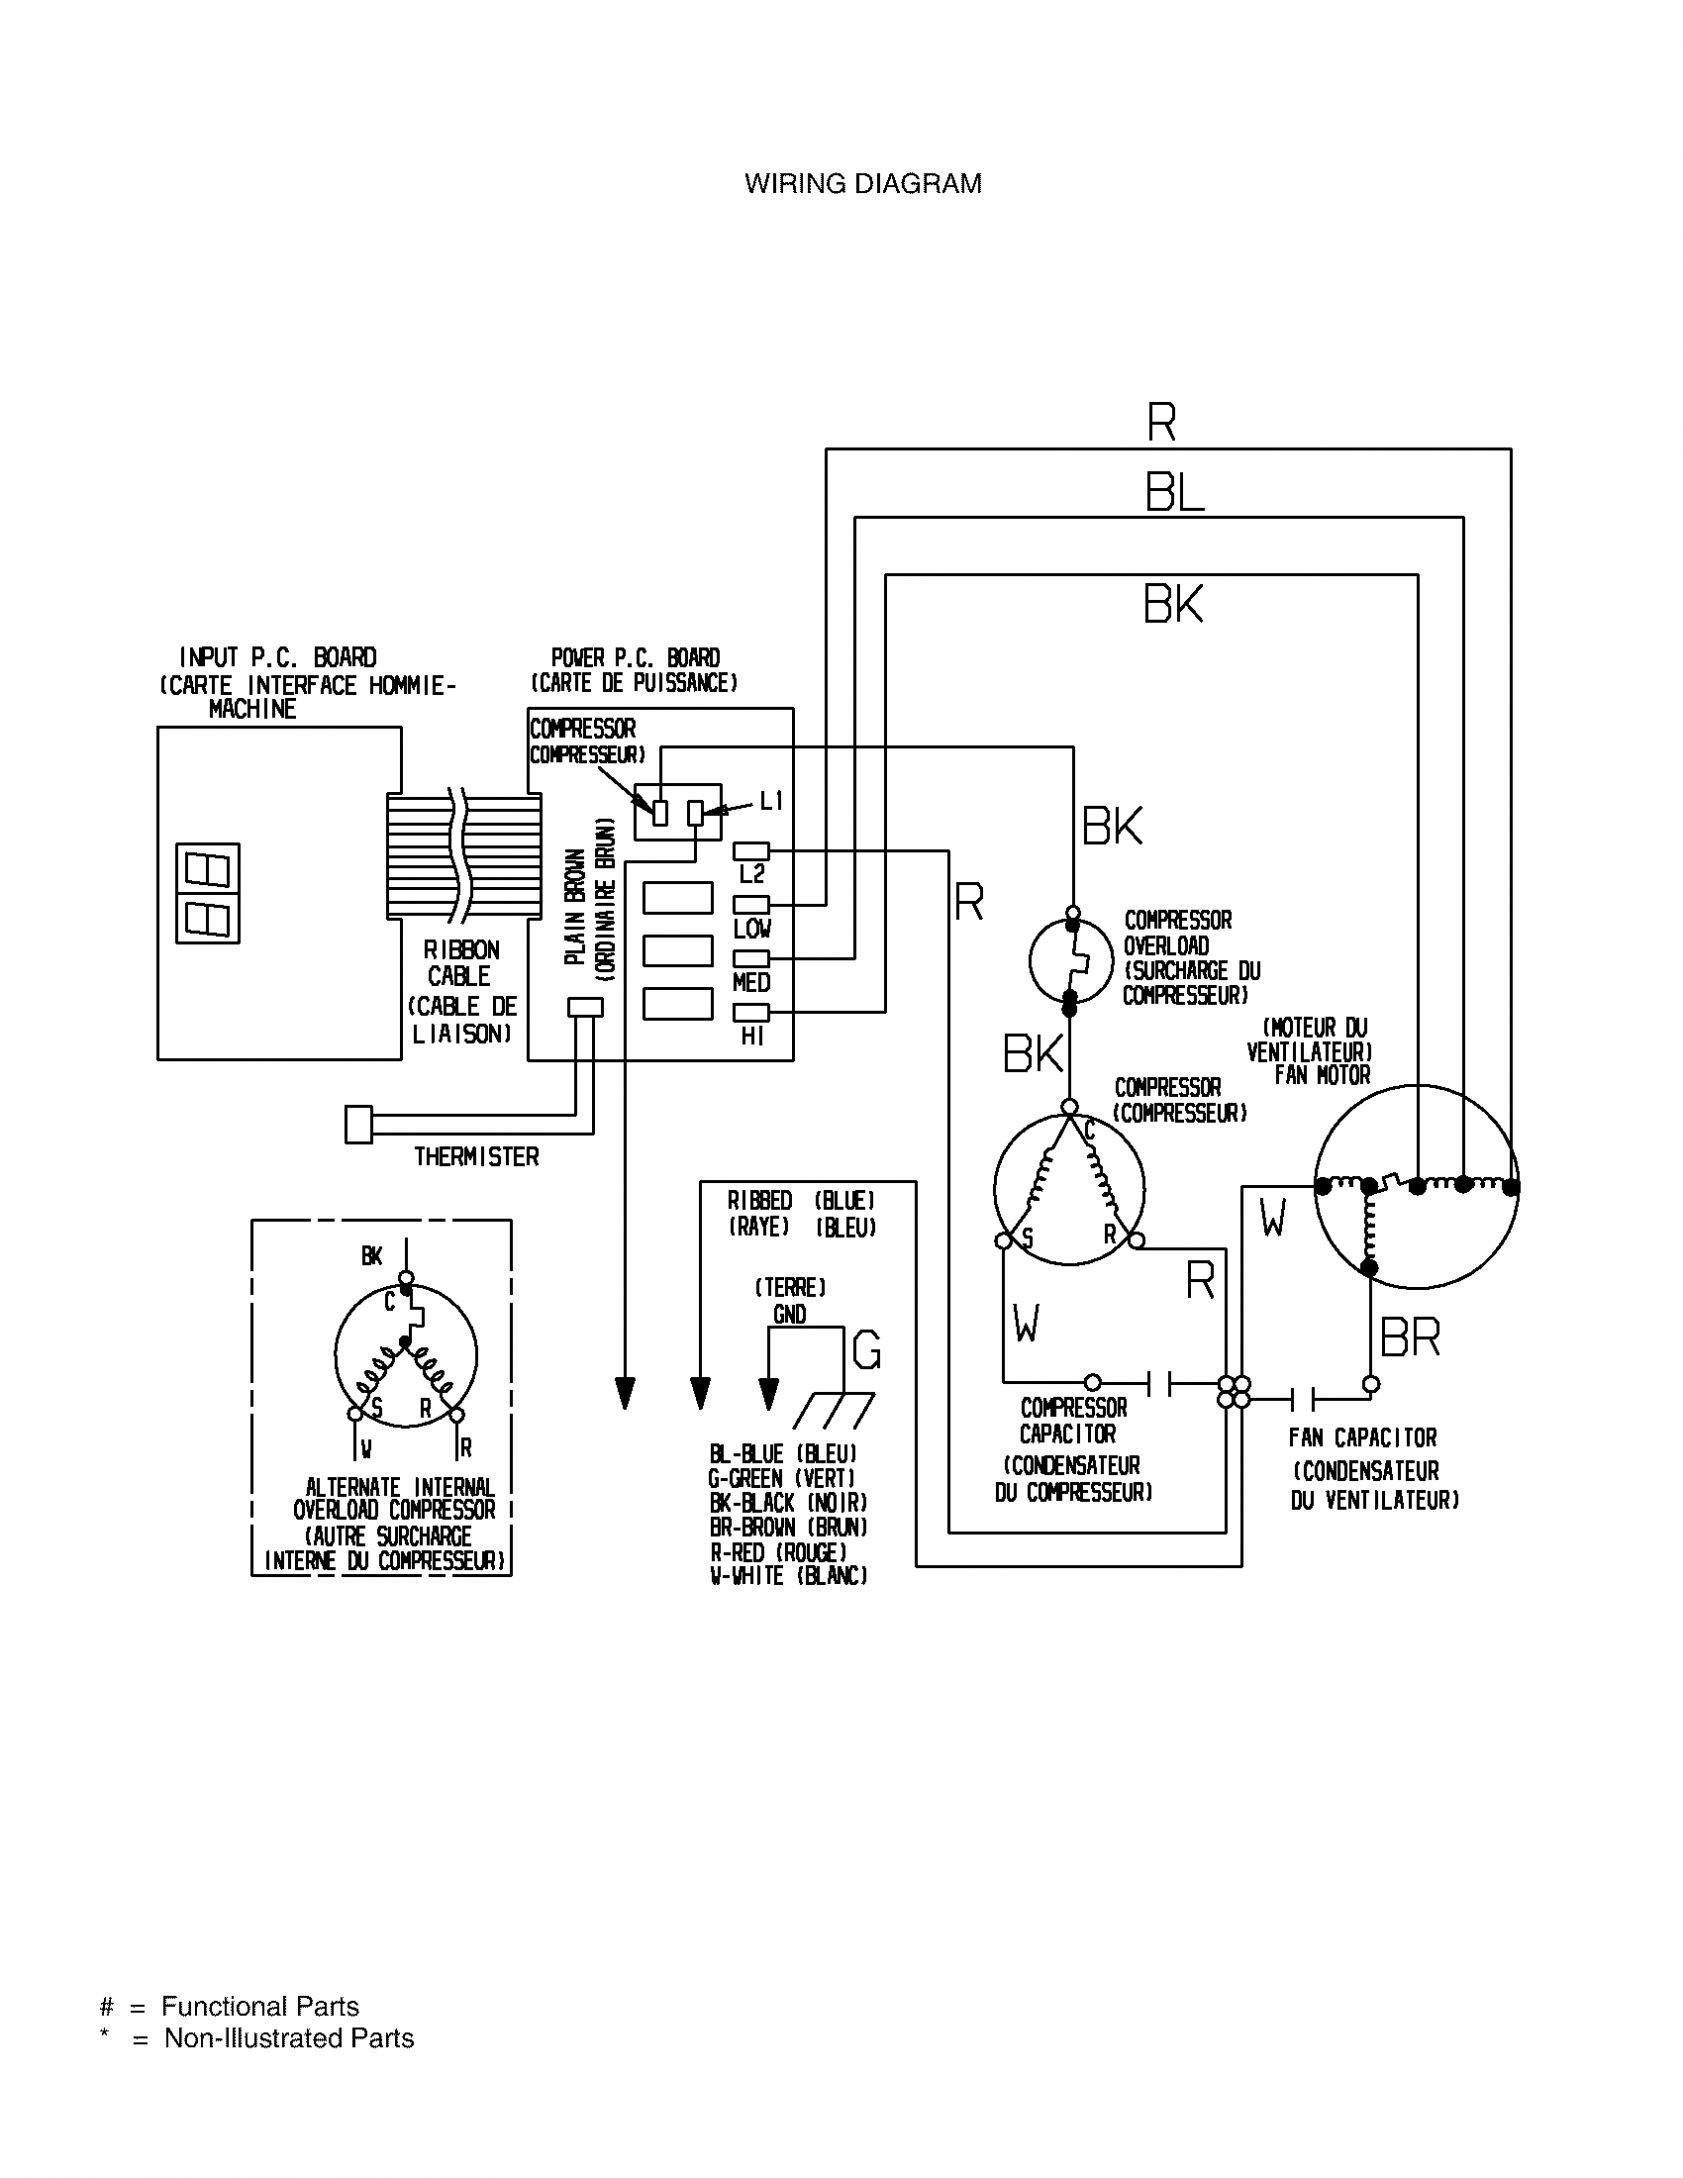 hight resolution of lance truck camper wiring diagram camper ac wiring wiring diagram of lance truck camper wiring diagram